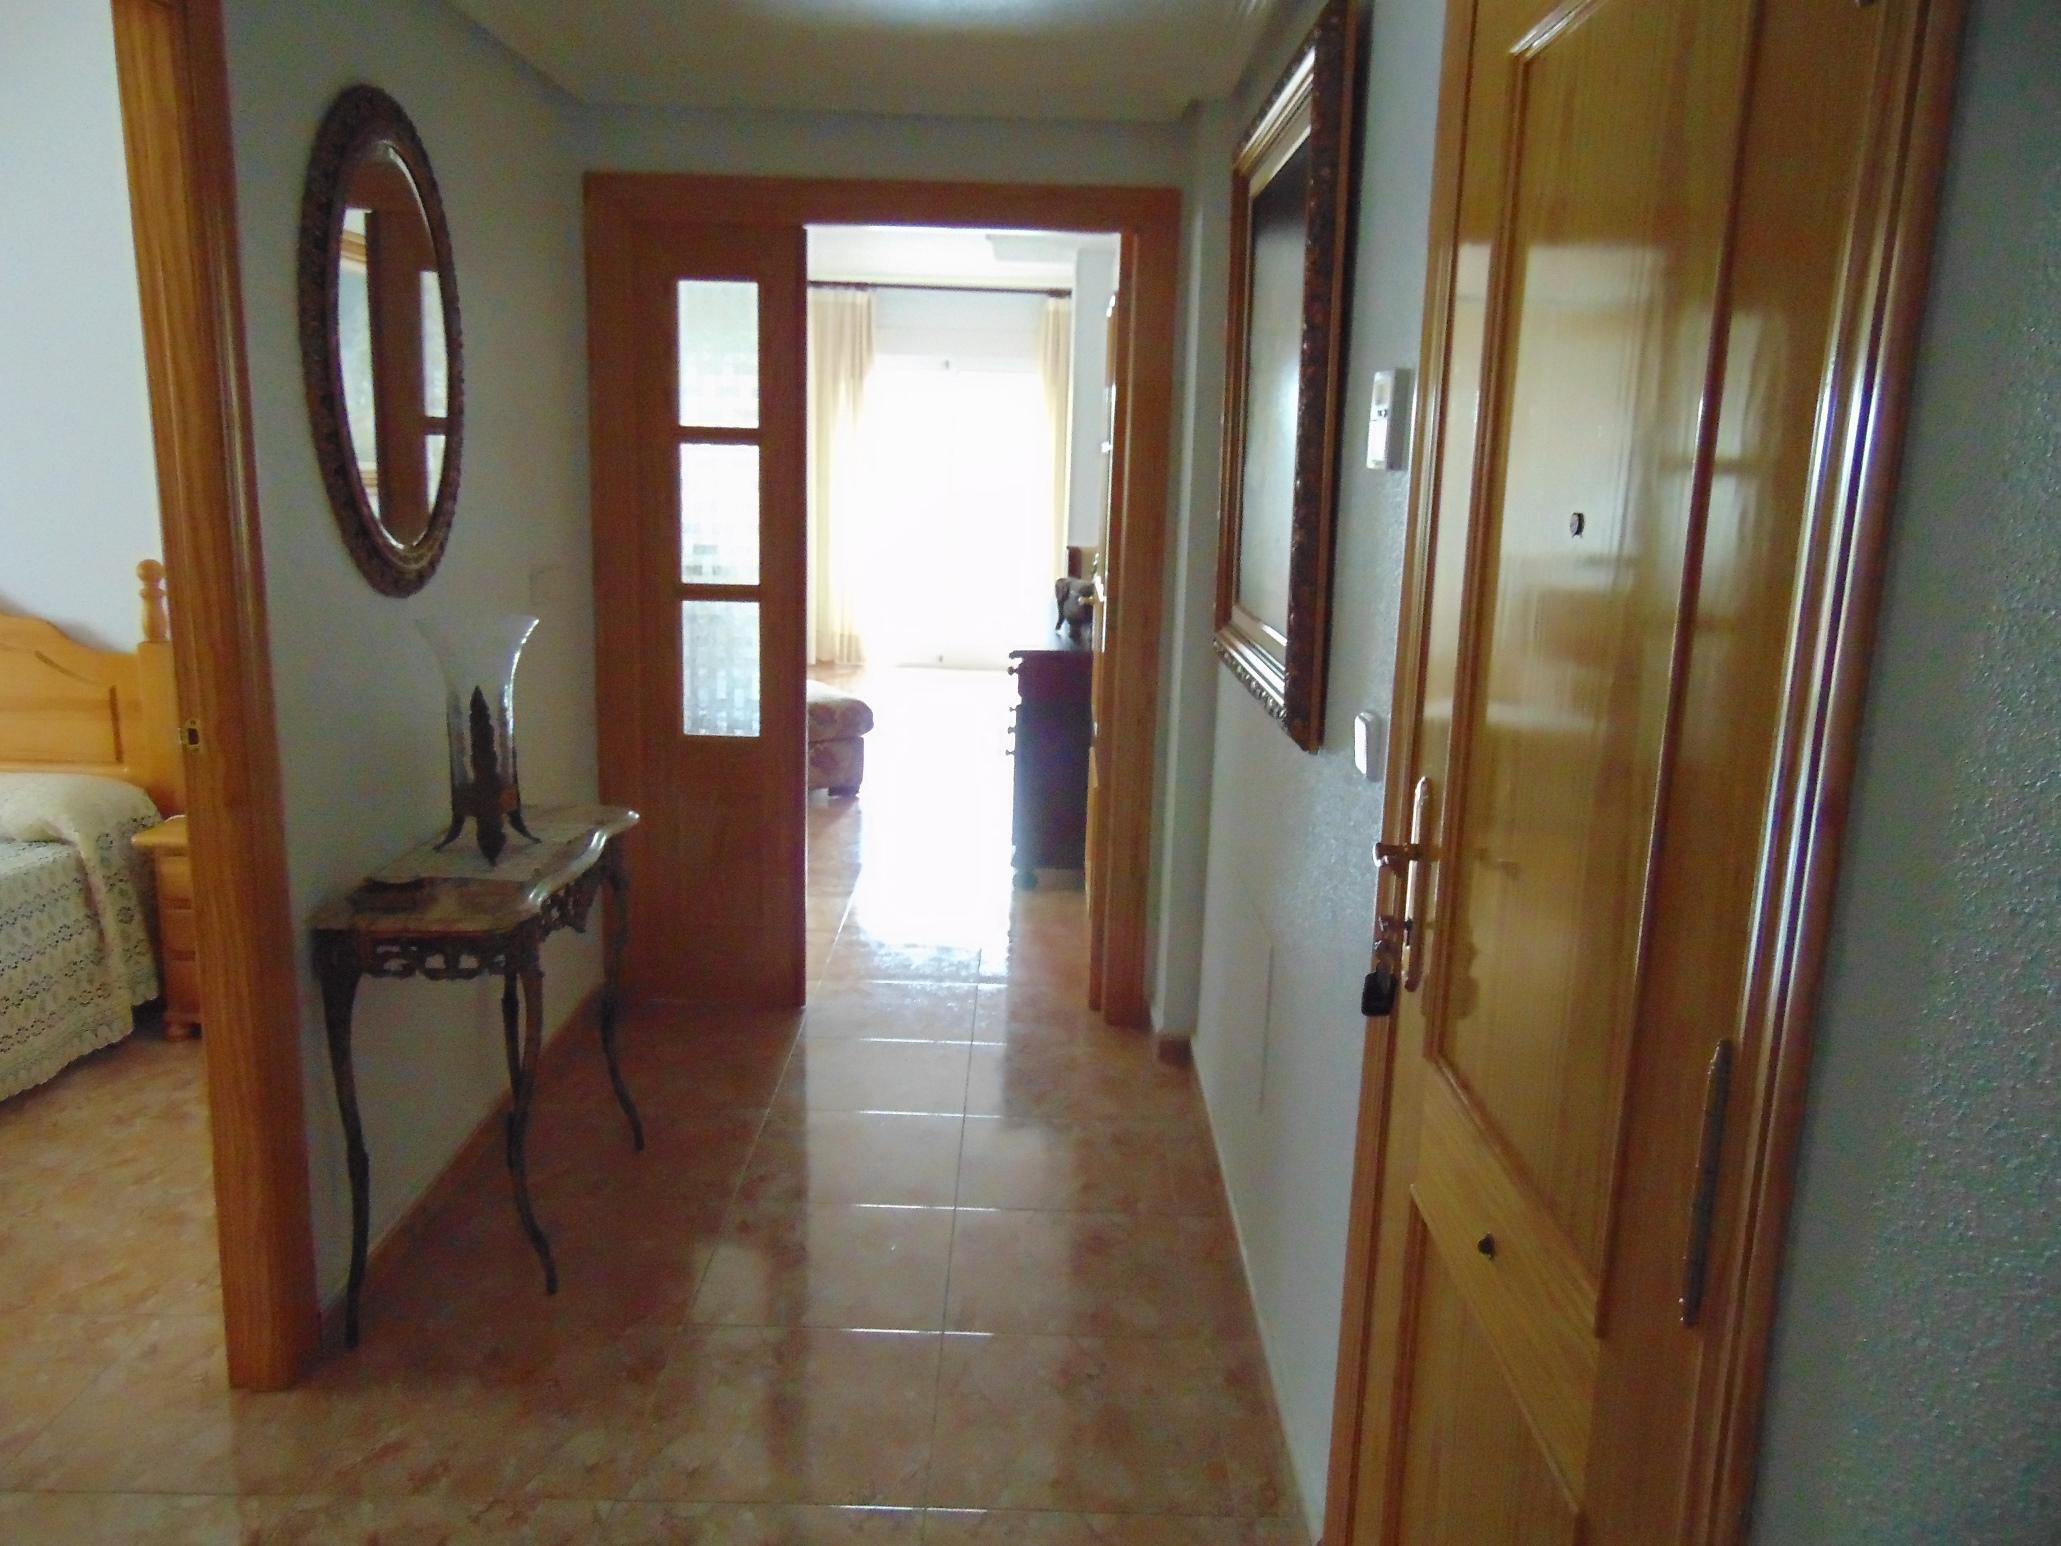 Propery For Sale in San Pedro del Pinatar, Spain image 19